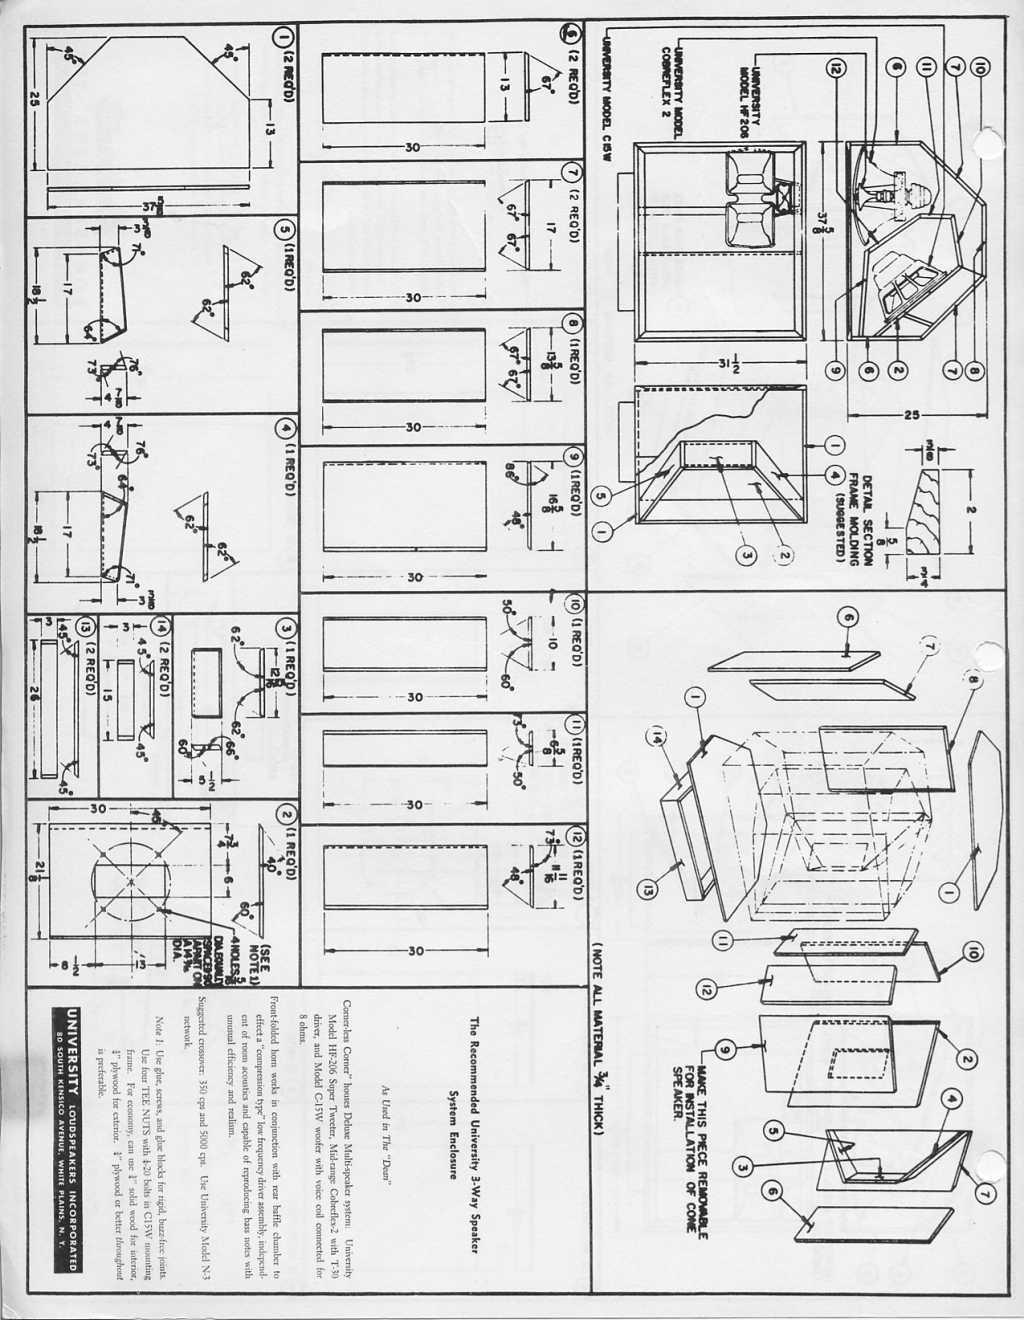 university classic corner plans technical modifications the klipsch audio community. Black Bedroom Furniture Sets. Home Design Ideas